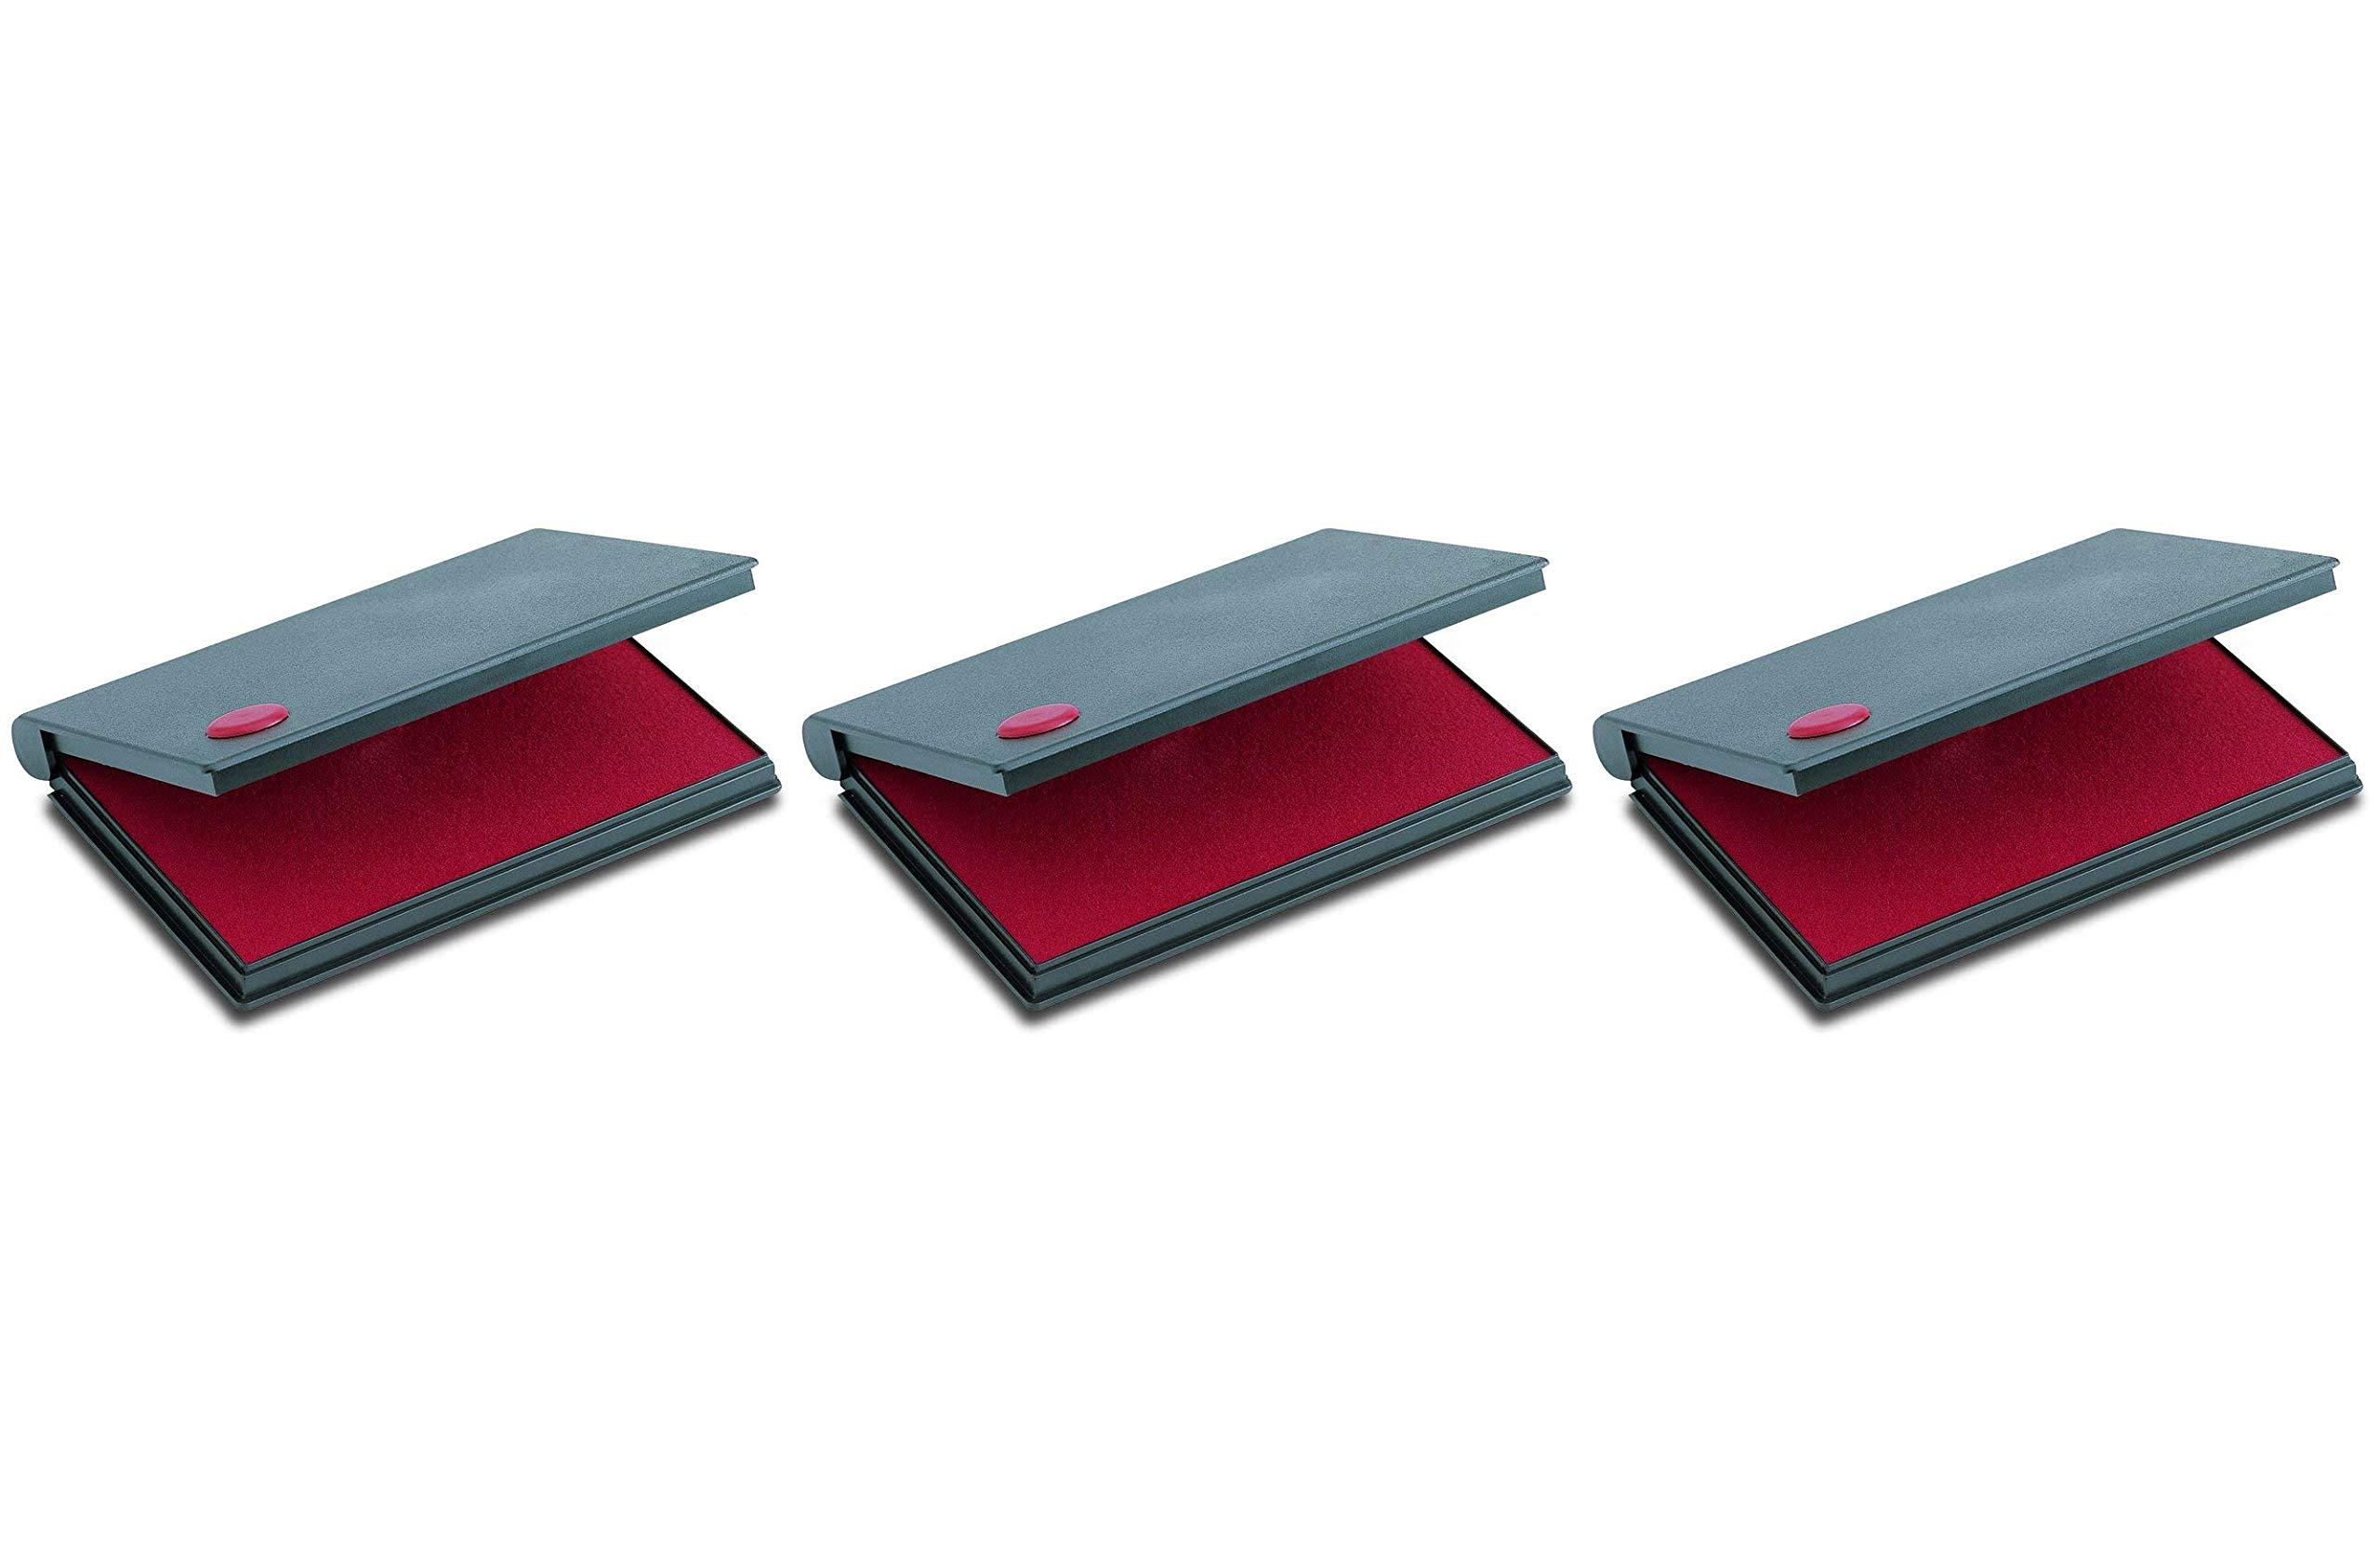 2000 PLUS Stamp Pad, Felt, Size No.2, 6-1/4'' X 3-1/2'', Red Ink (090411) (Тhrее Pаck) by 2000 PLUS